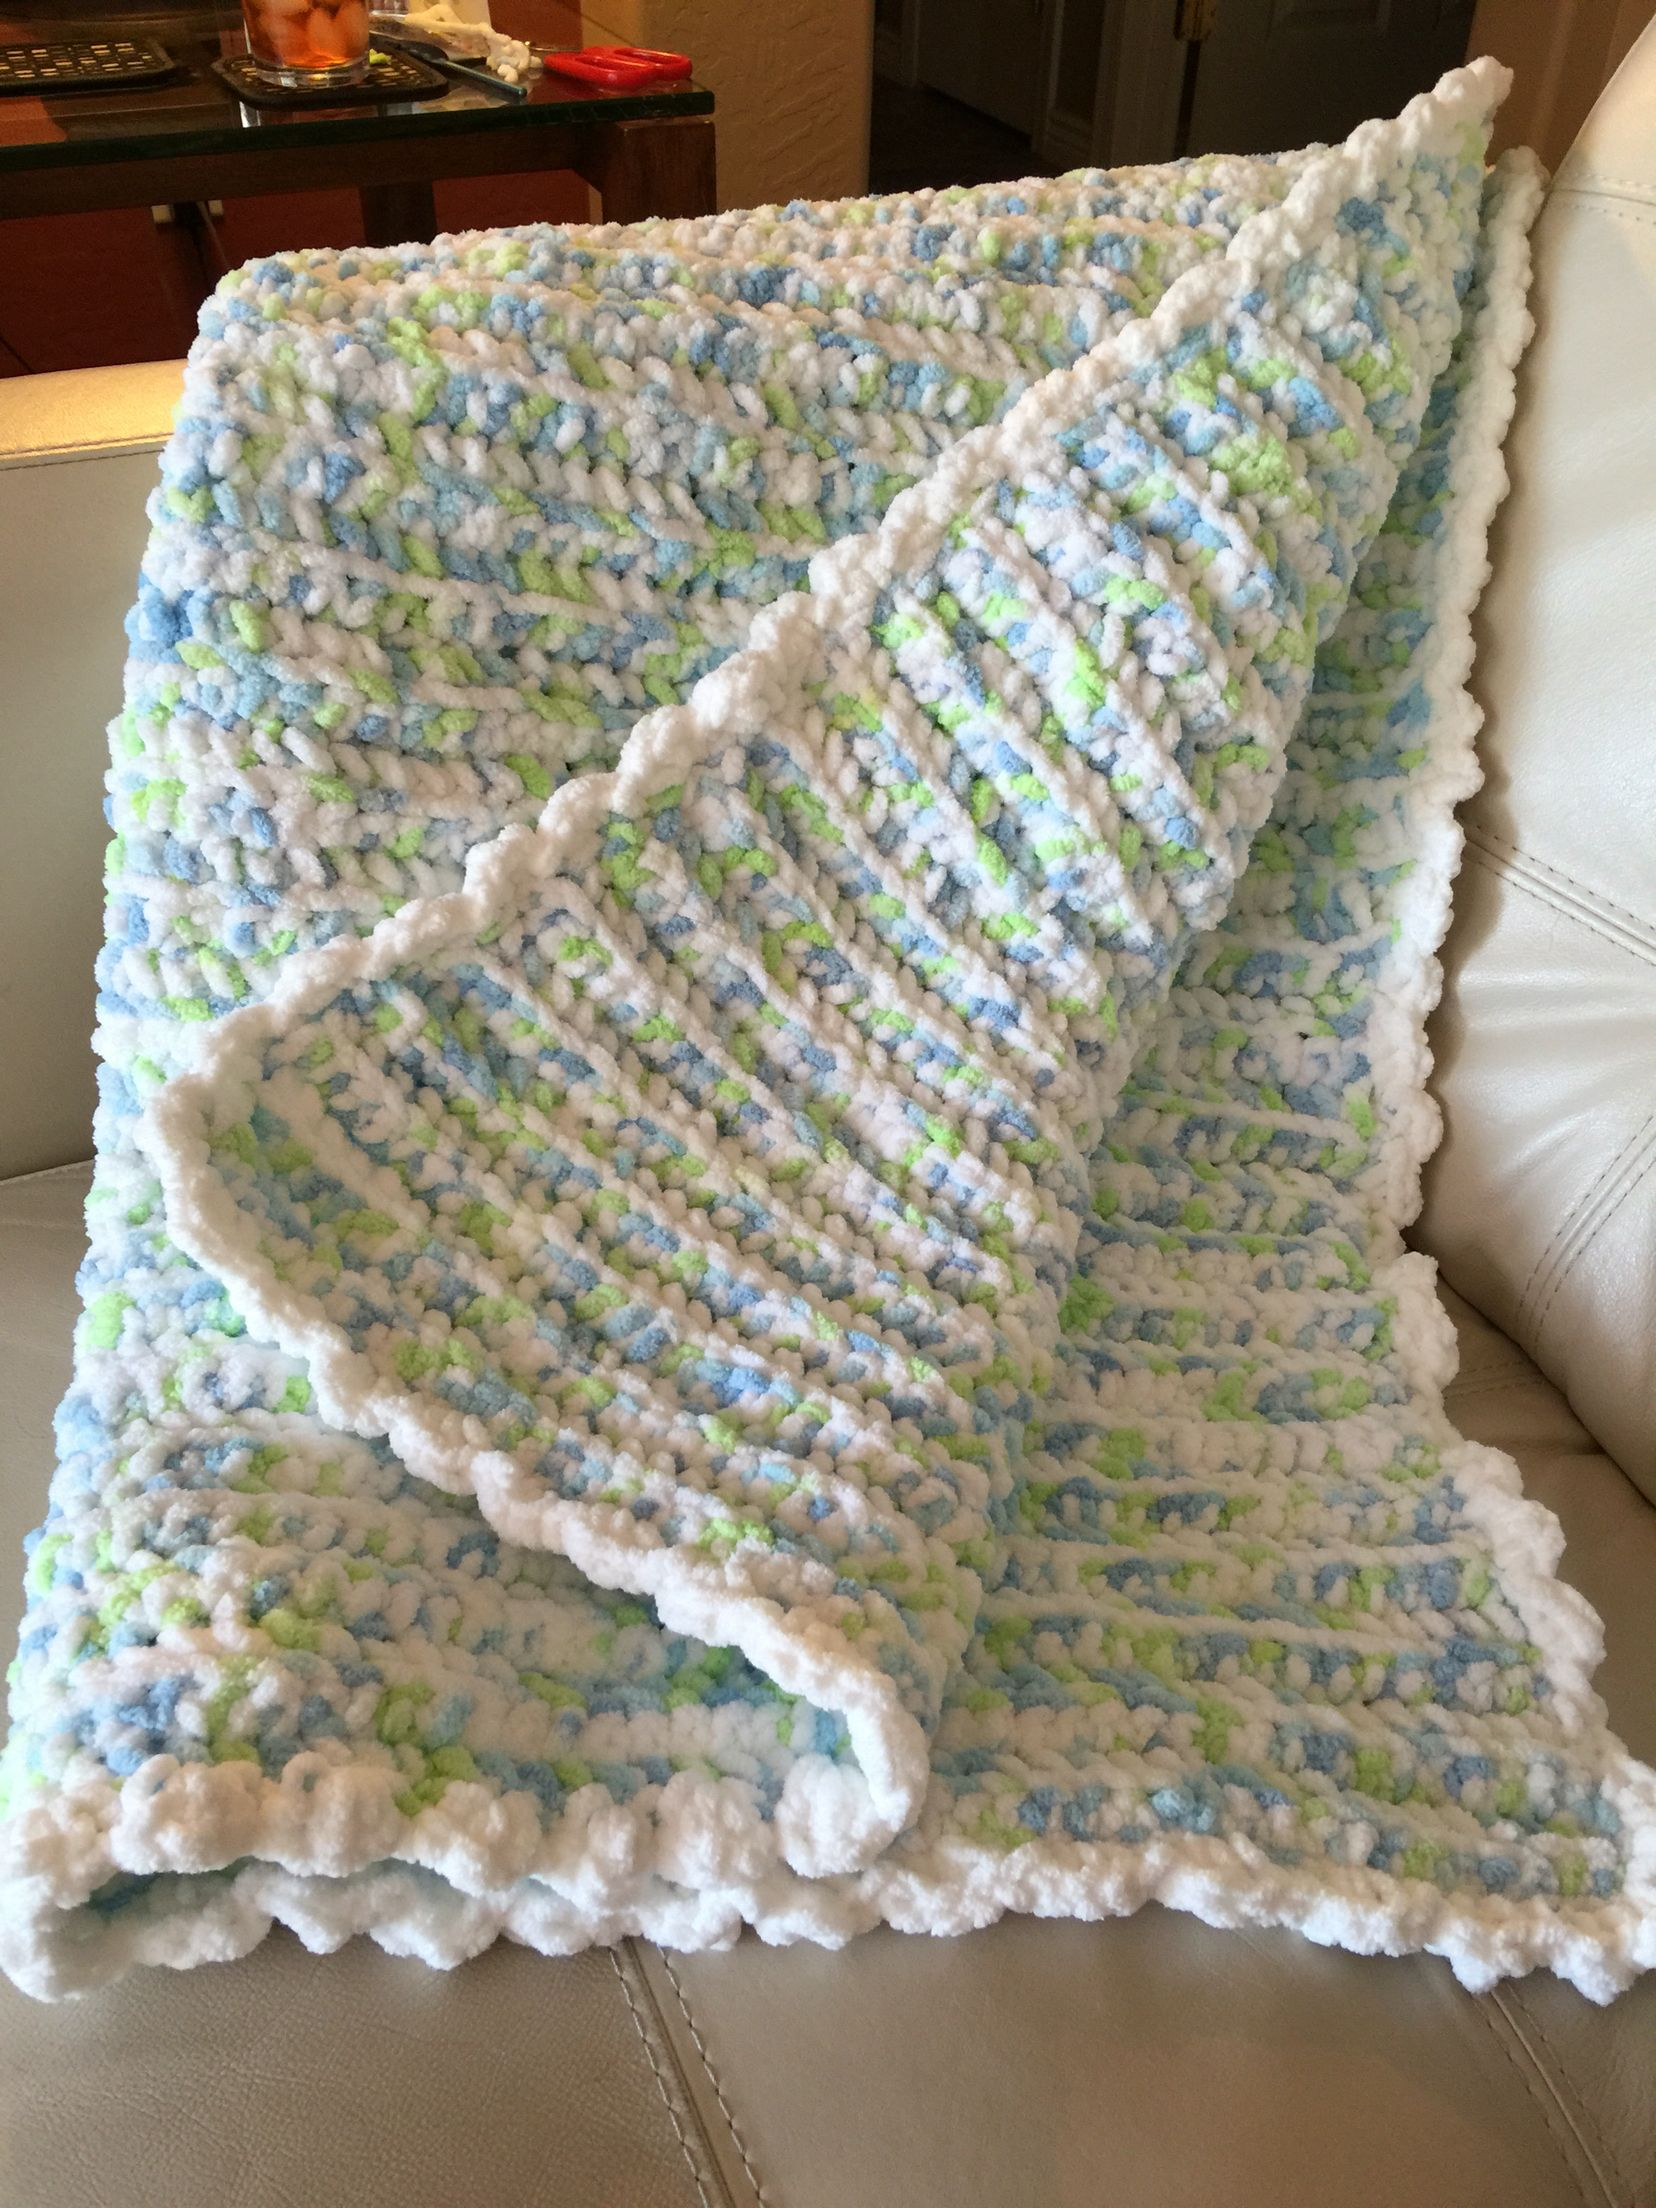 Crocheted baby quilt with Bernat baby blanket yarn | I Love Crochet ...